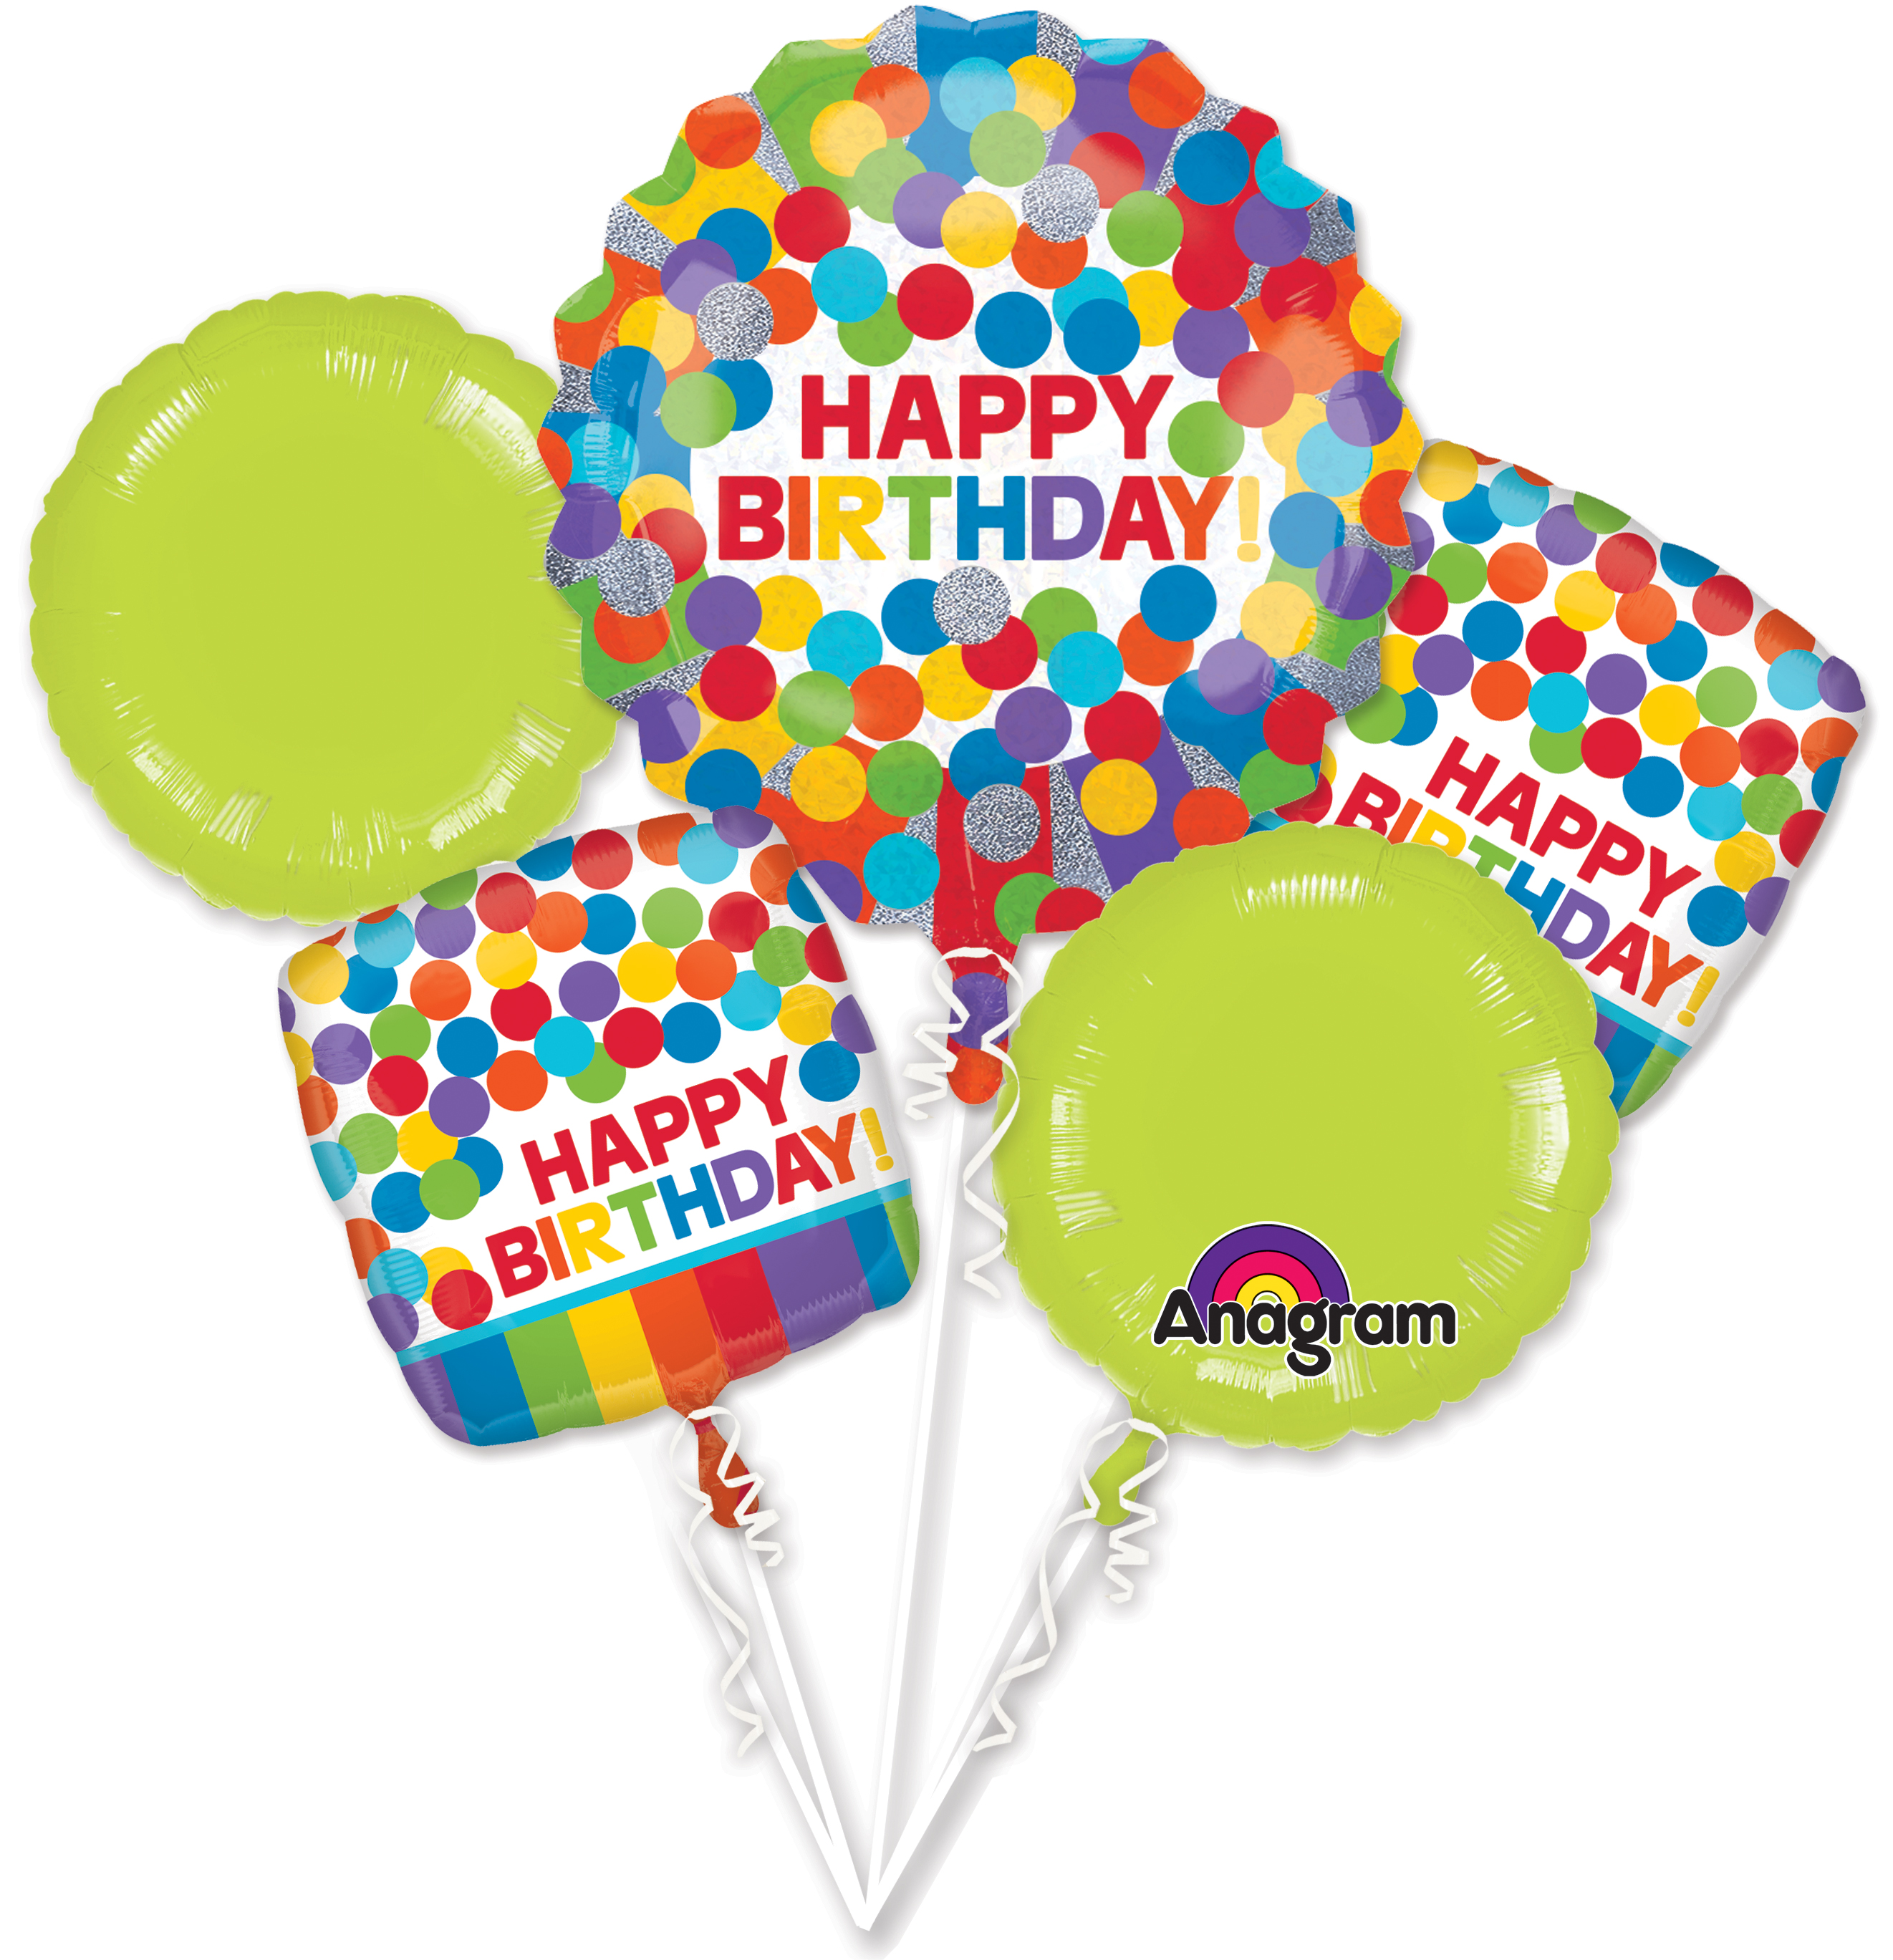 Bouquet Primary Rainbow Birthday Balloon Packaged